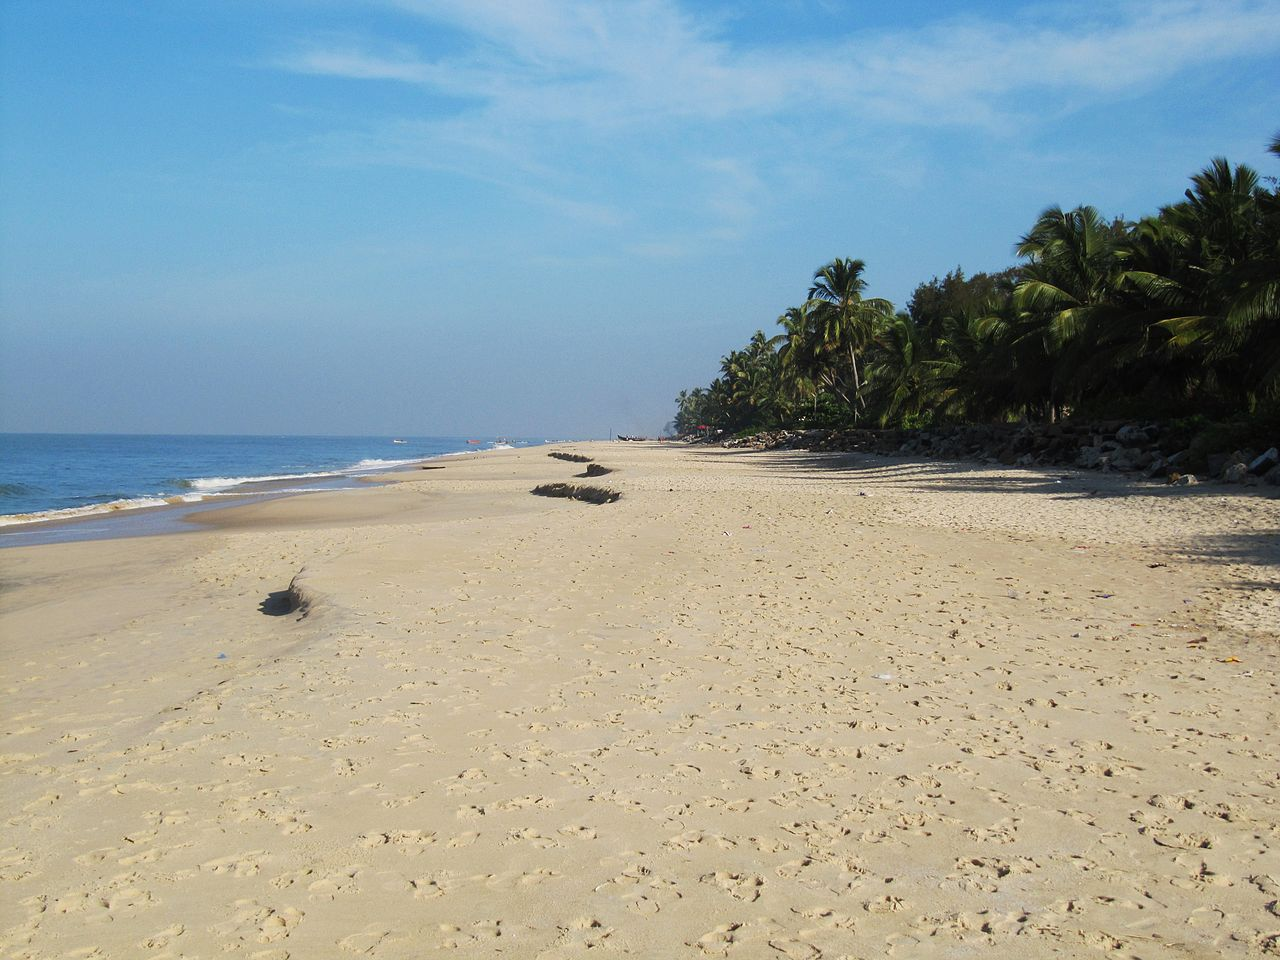 Alappuzha Beach - Top Rated Beach of Kerala